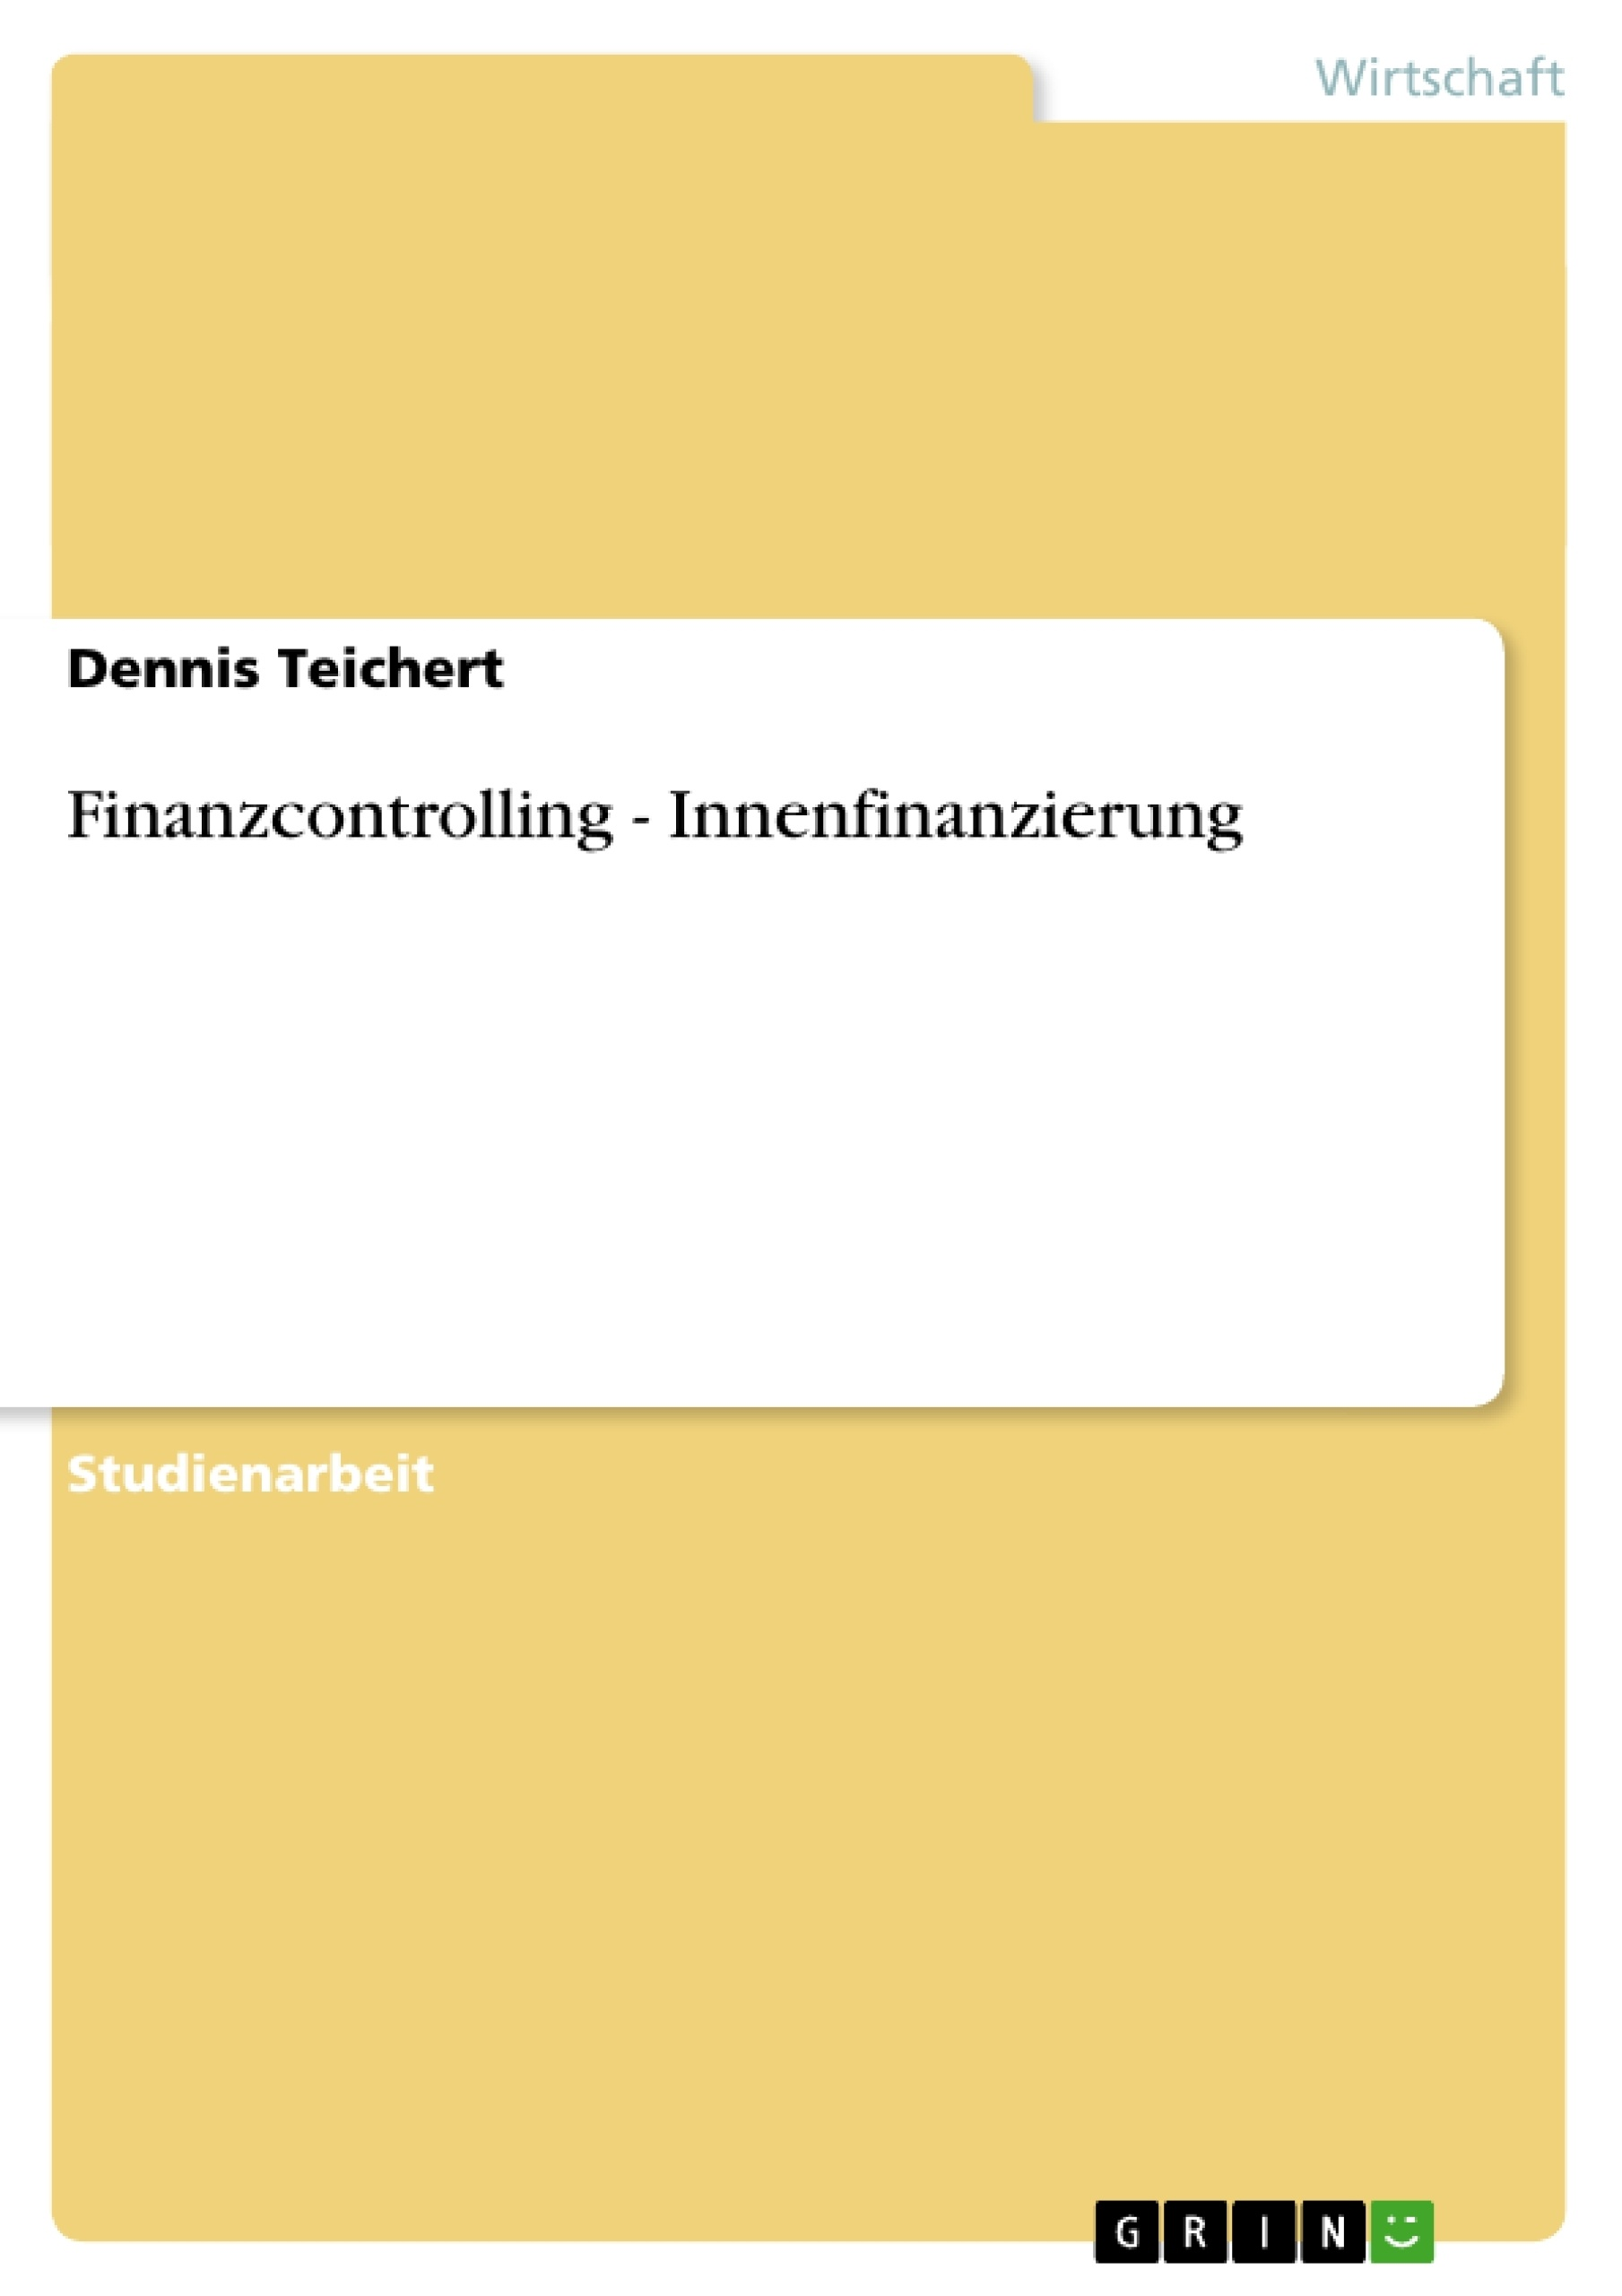 Titel: Finanzcontrolling - Innenfinanzierung